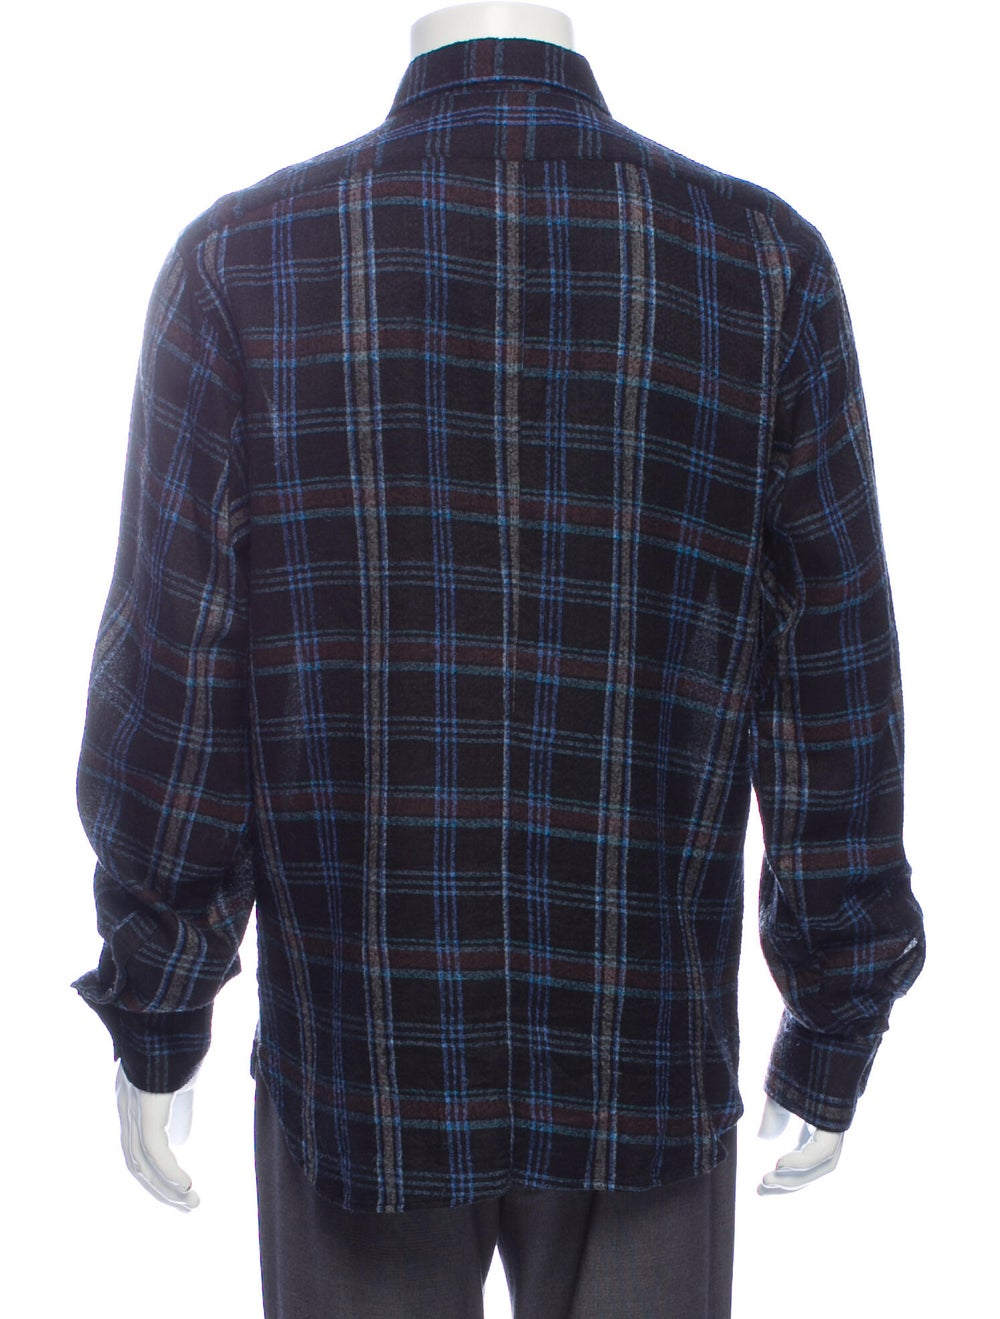 Dries Van Noten Silk Plaid Print Shirt Blue - image 3